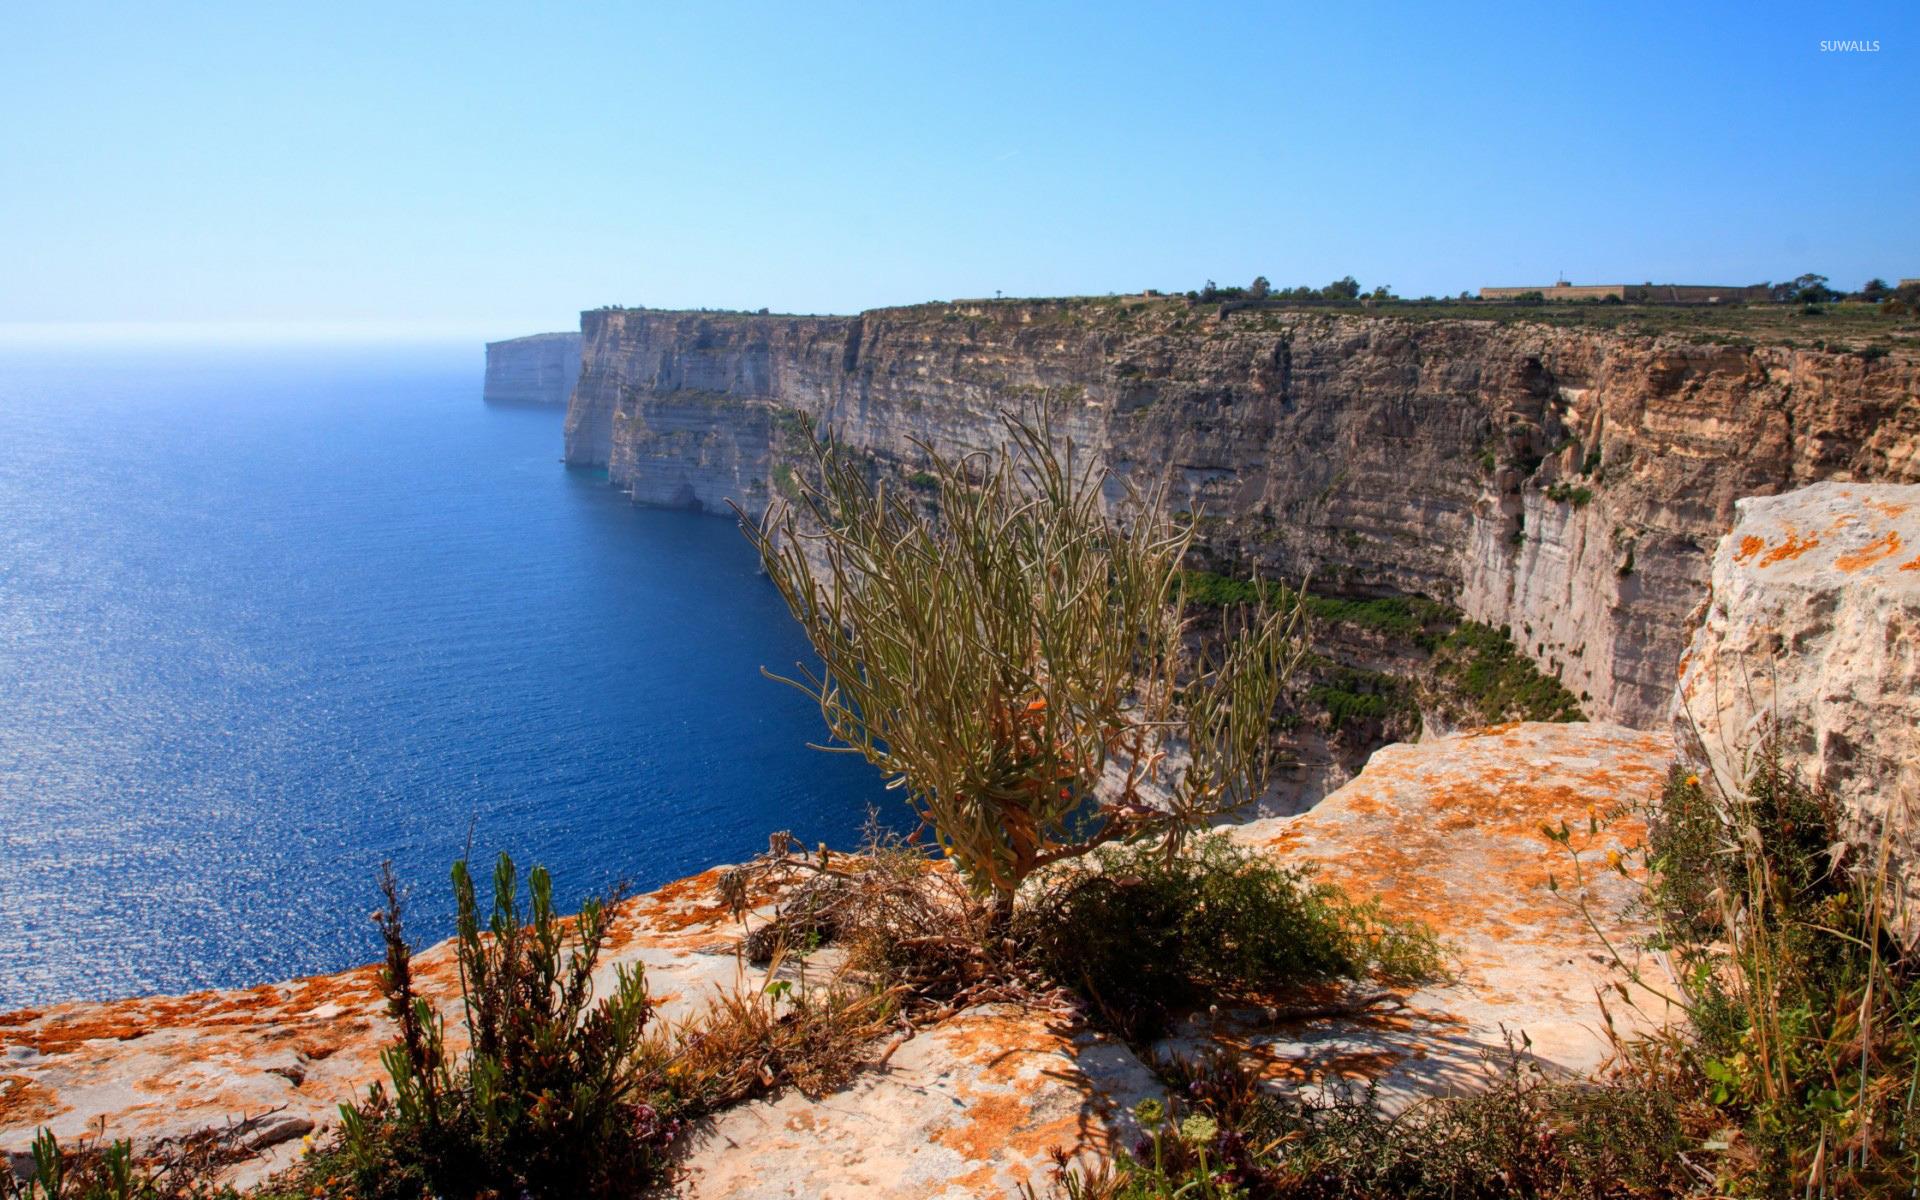 malta shore wallpaper   beach wallpapers   39405